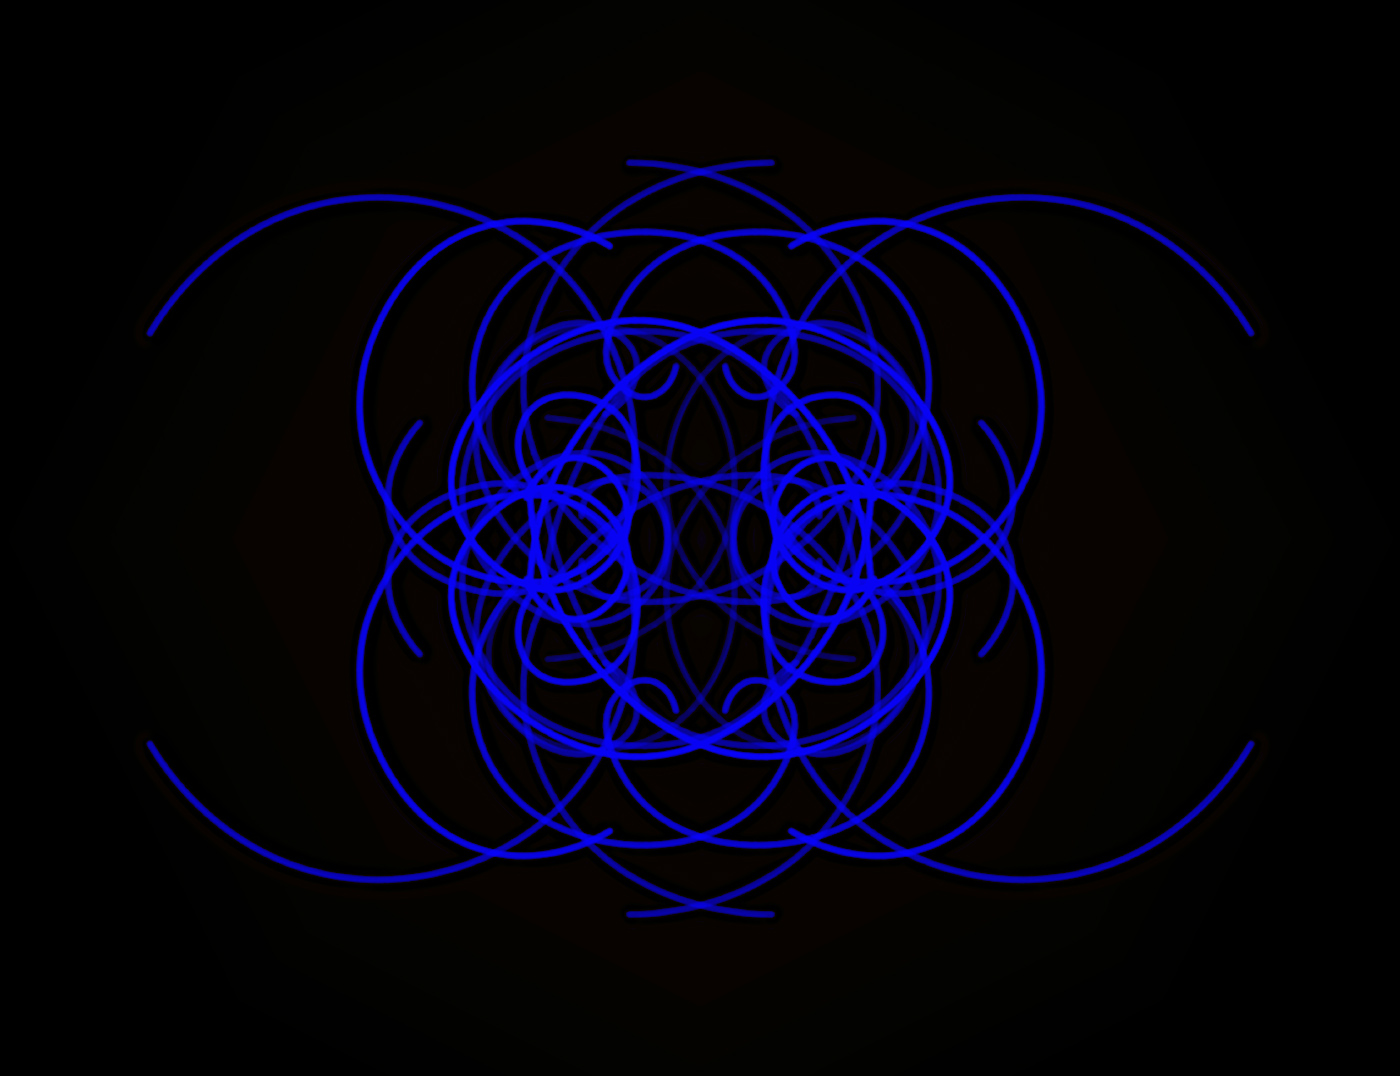 Randy Gibson's <em>Quadrilateral Starfield Symmetry T:O Base 7:172</em>